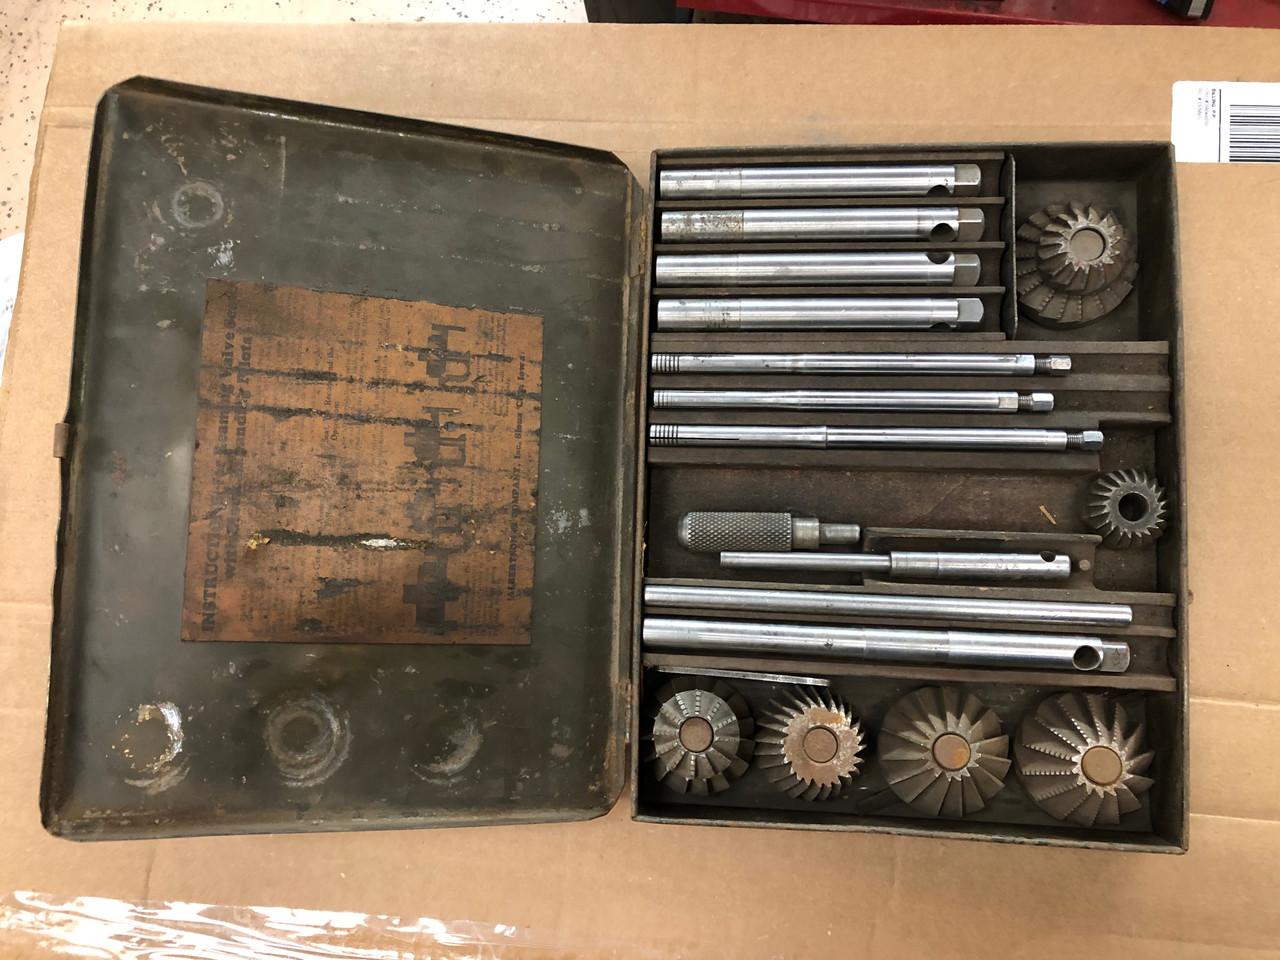 Vintage Sioux Valve Seat Cutter Set